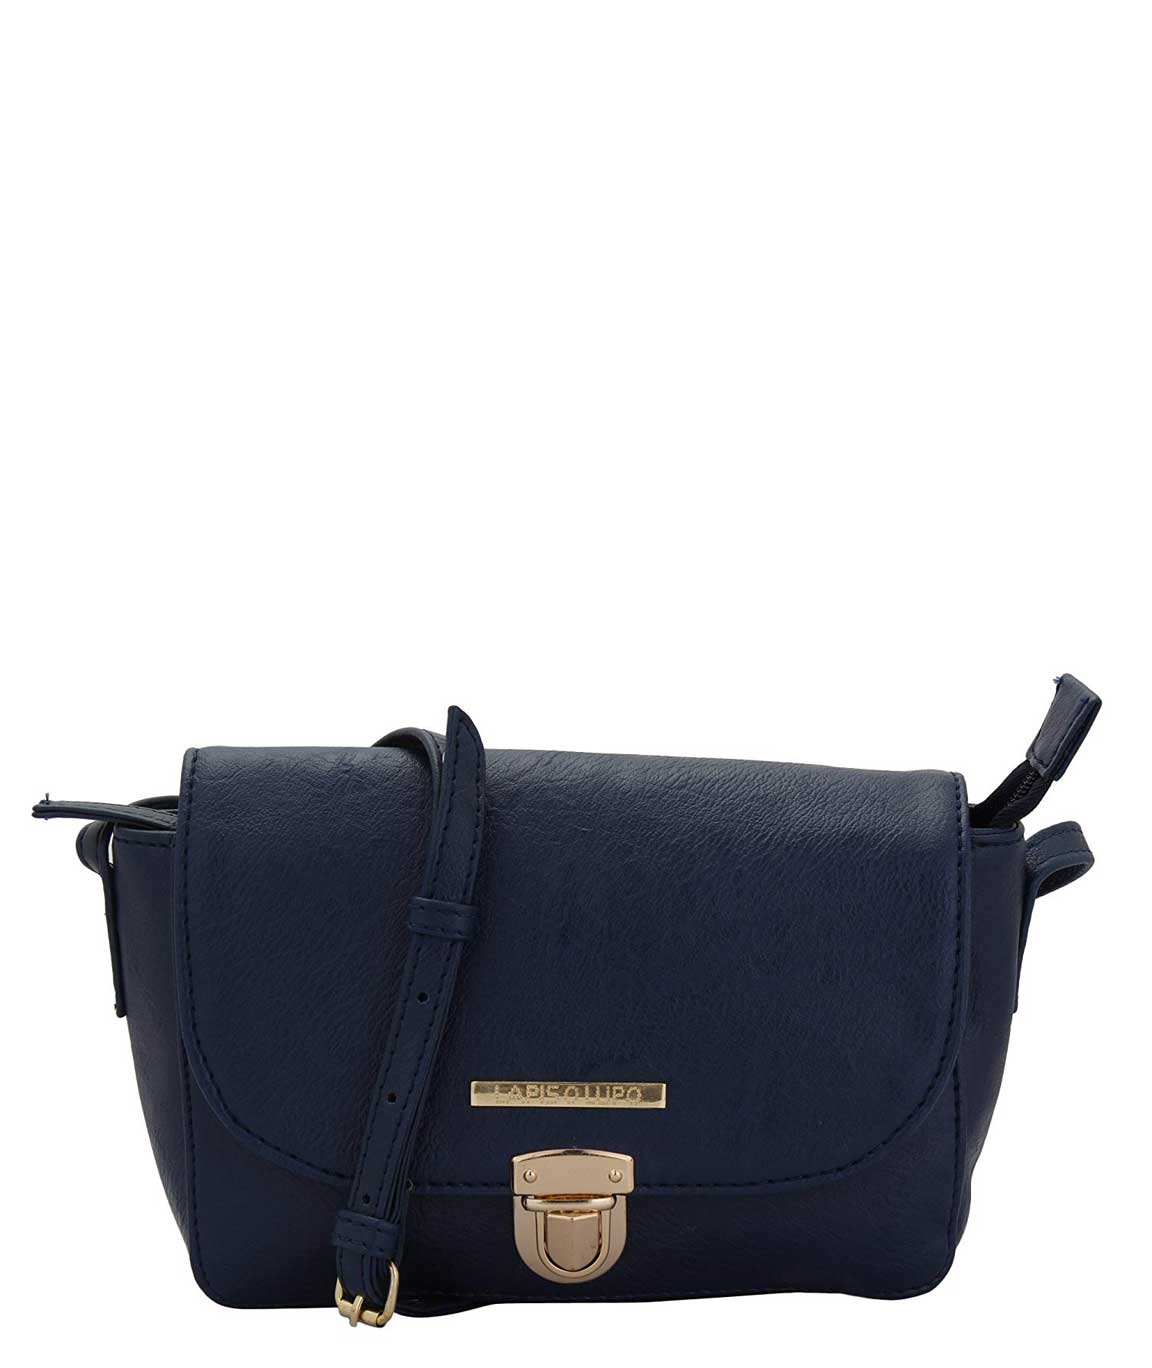 Lapis O Lupo Lewd Women's Sling Bag (Blue)